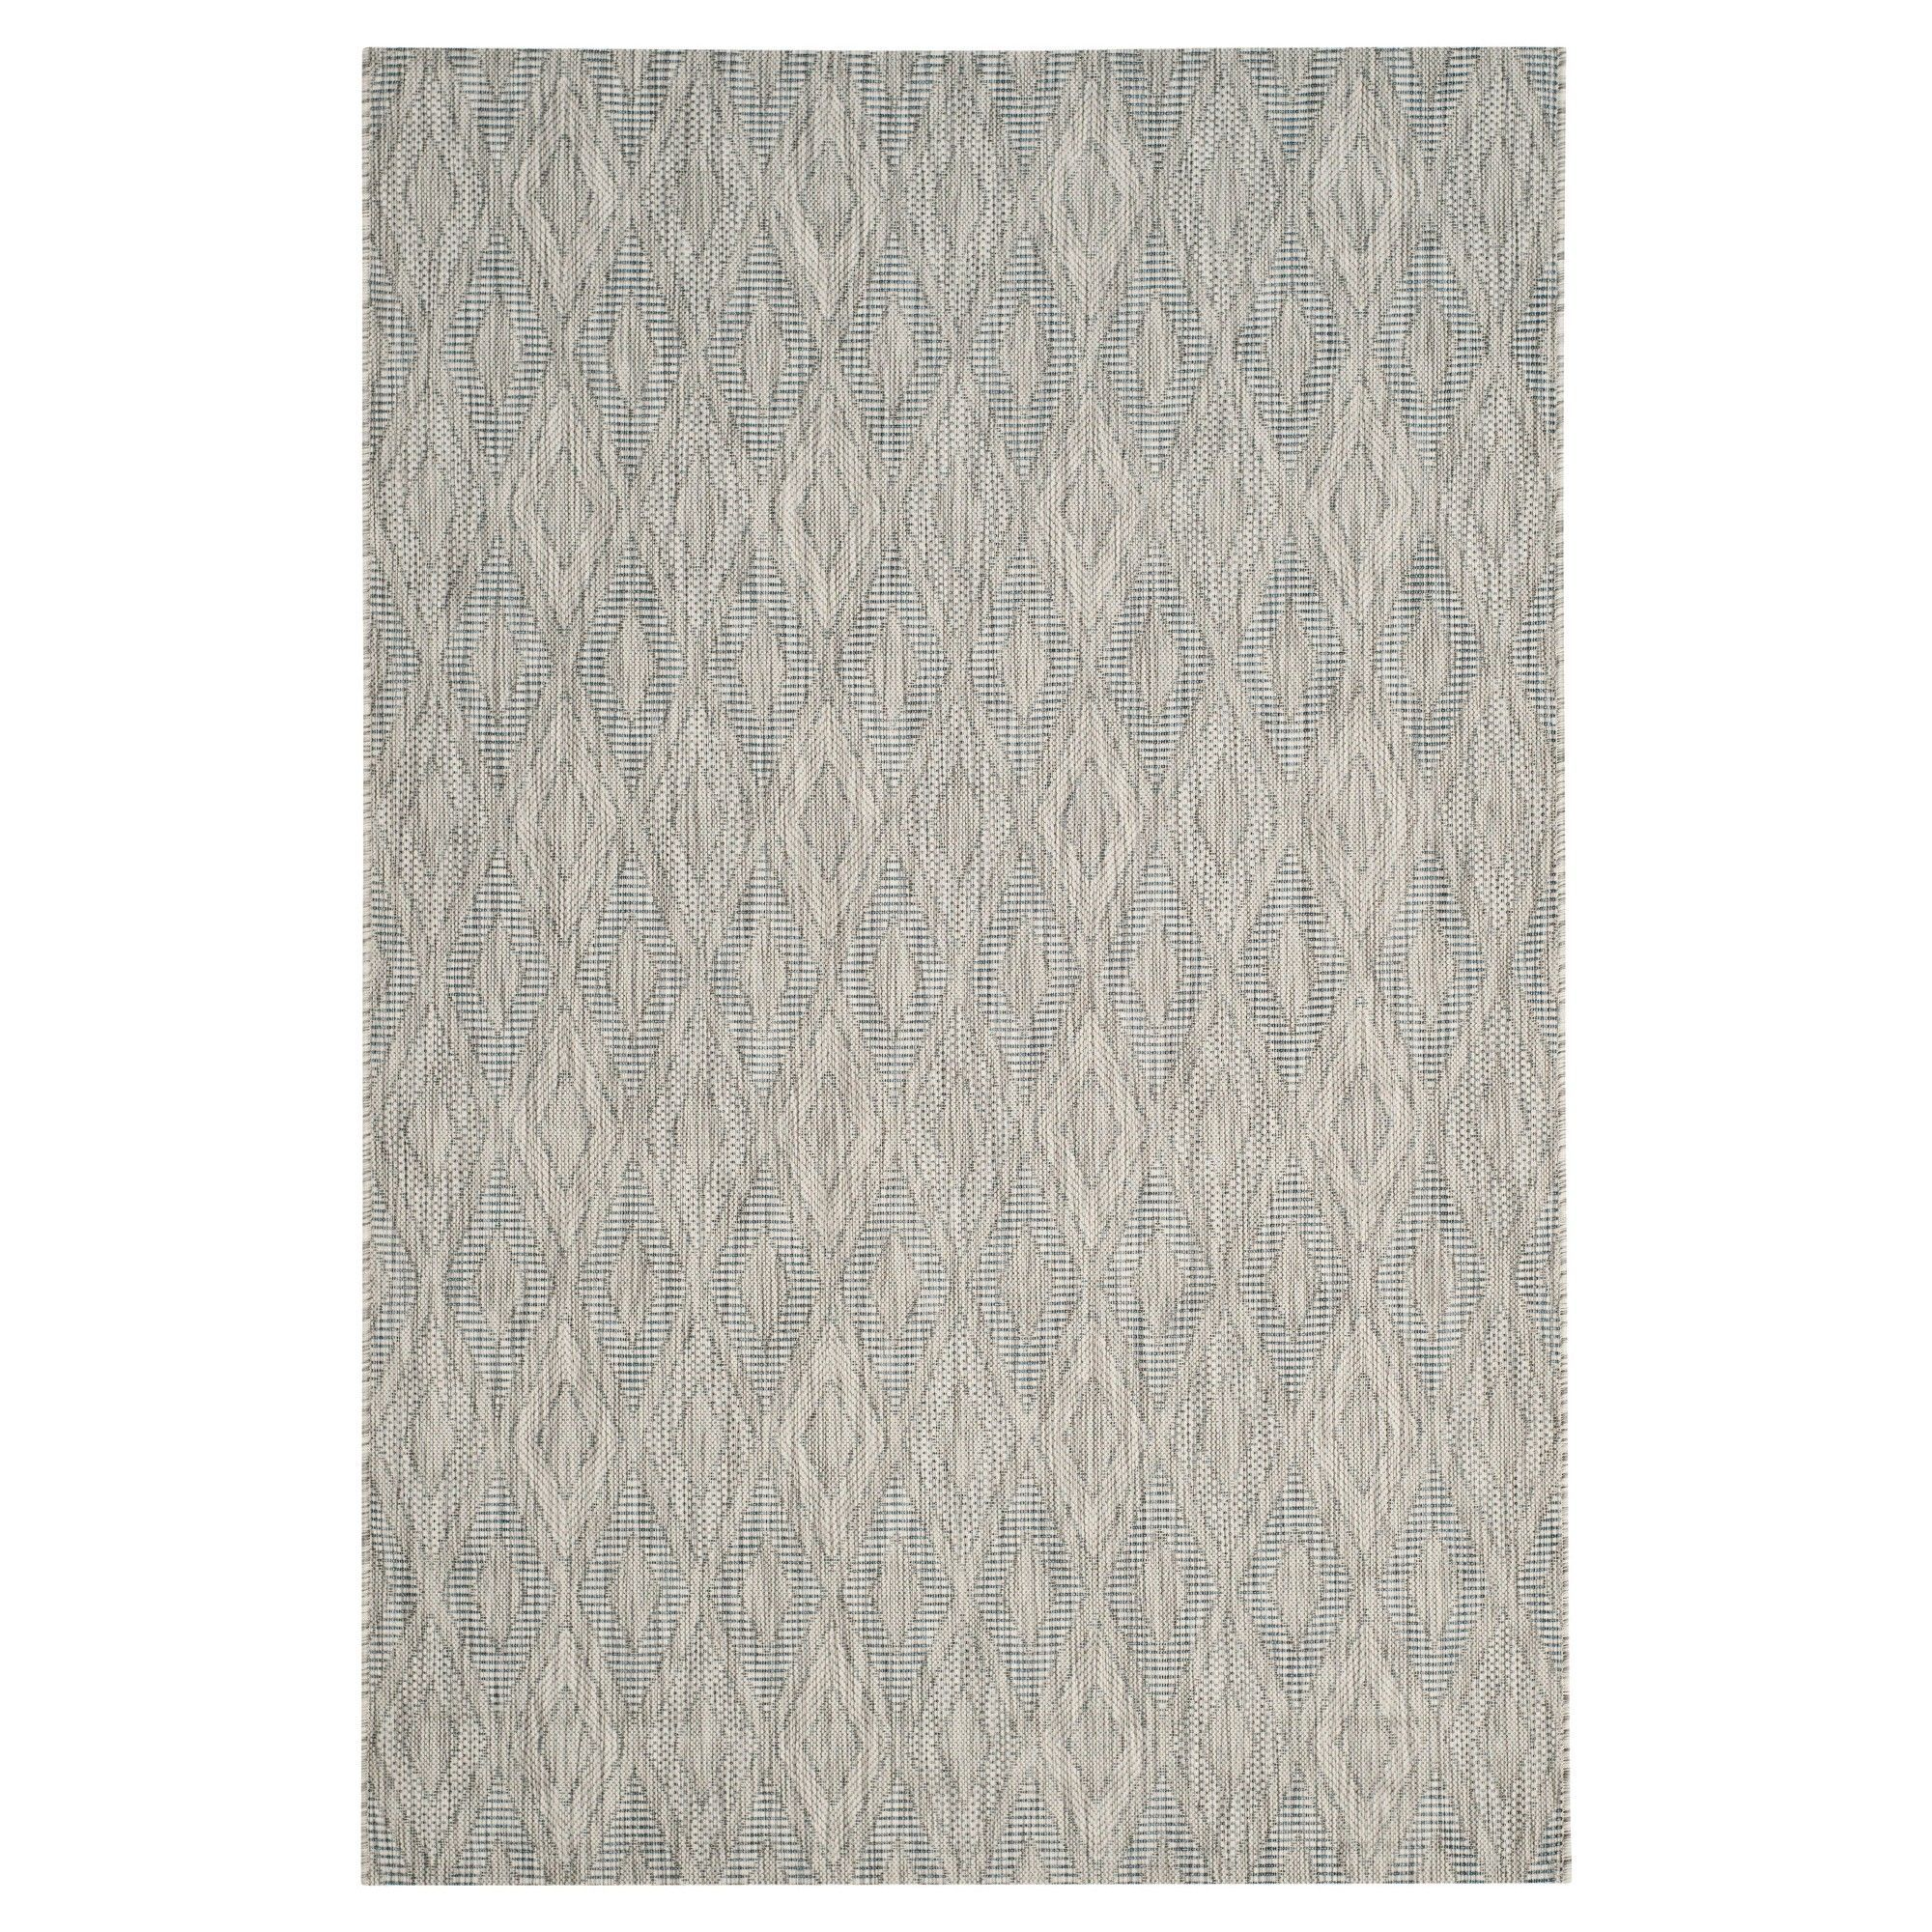 Bolton Square 6 7 X Outdoor Patio Rug Gray